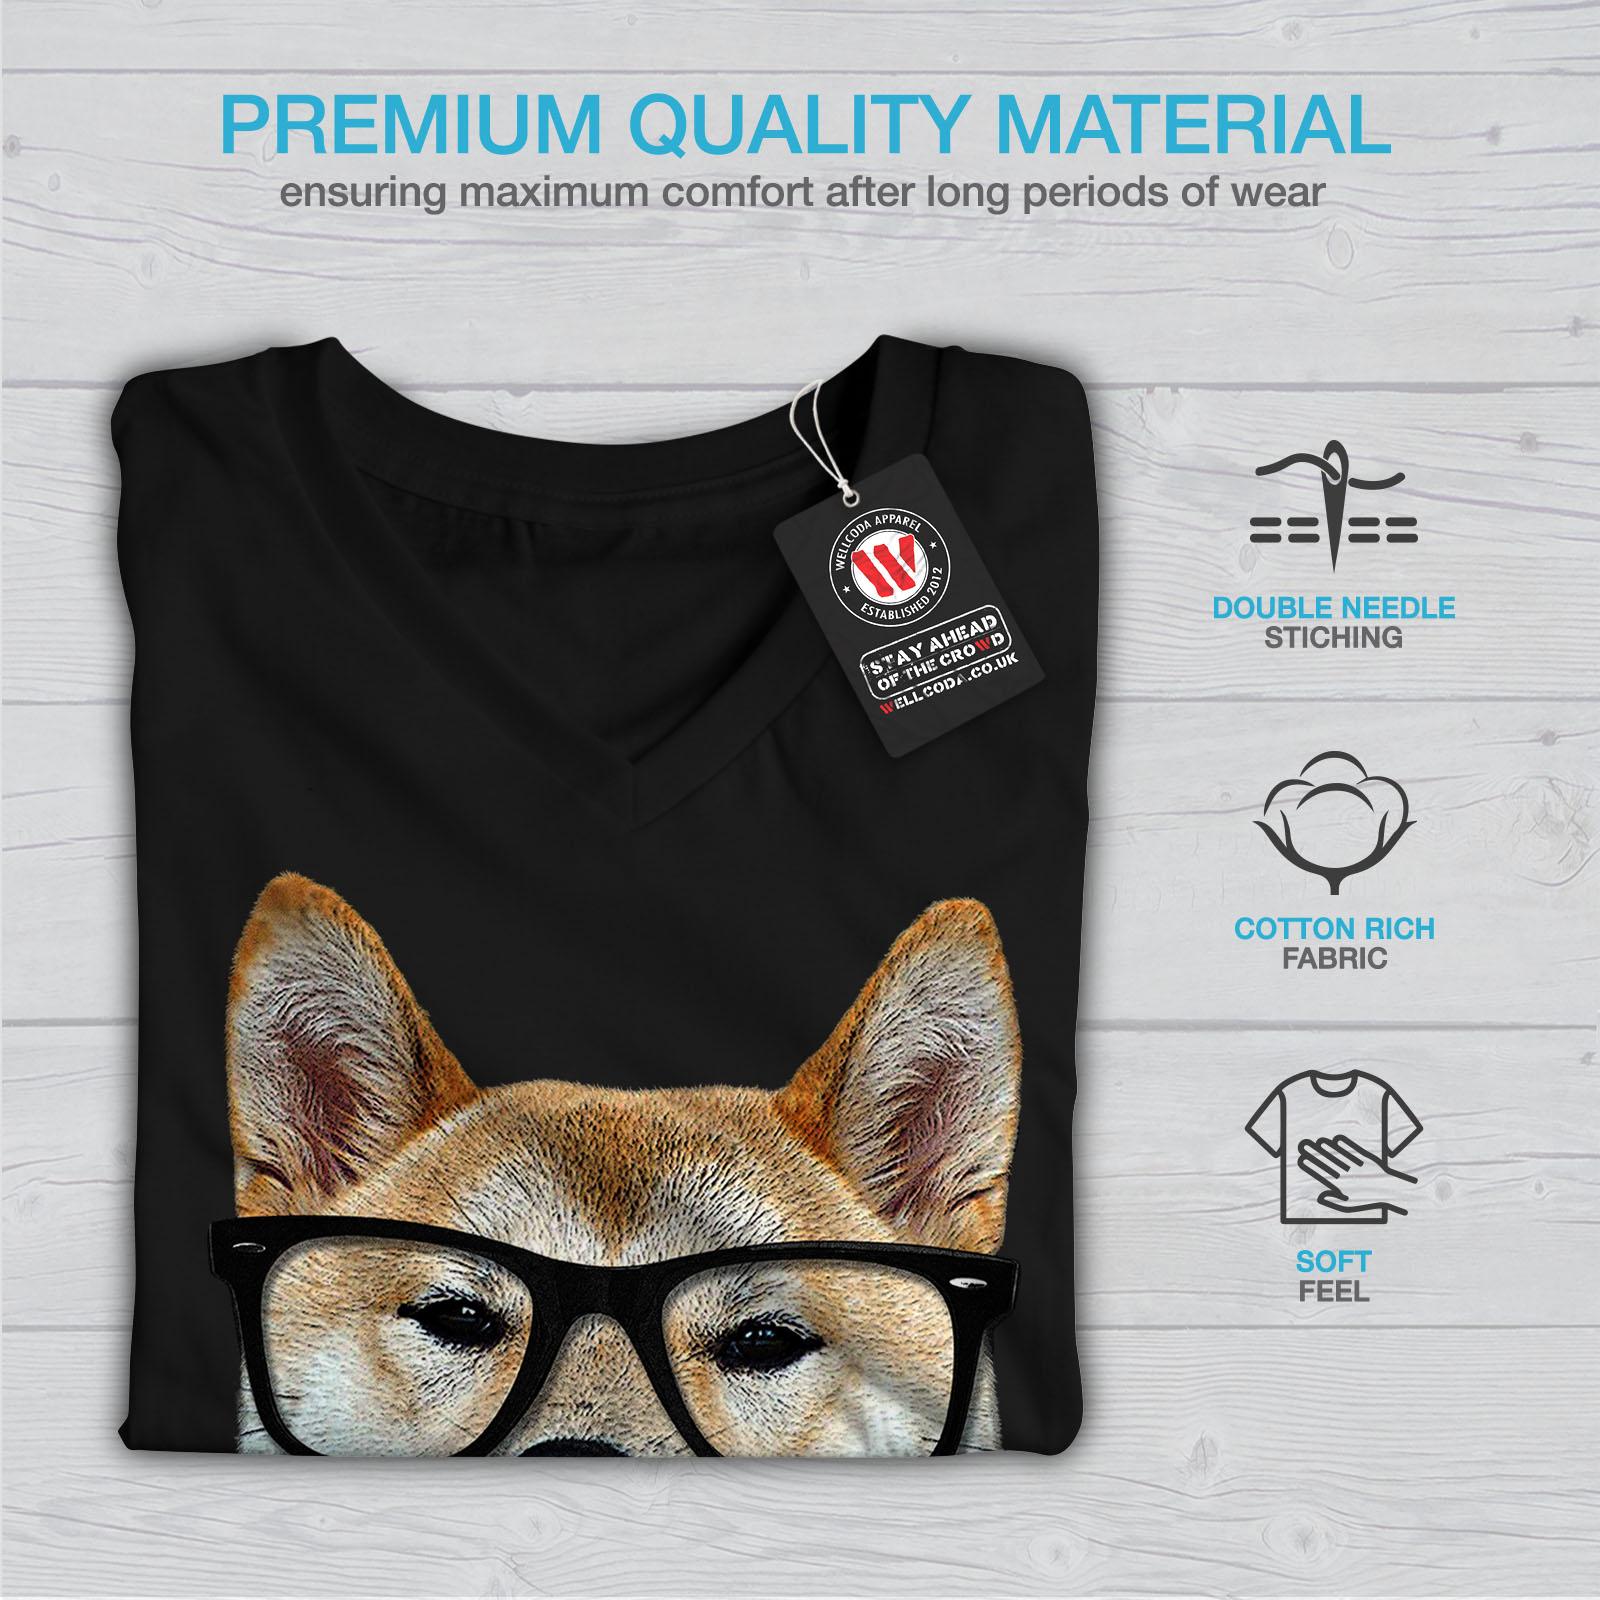 Wellcoda Smart Shiba Inu Dog Womens V-Neck T-shirt Sharp Graphic Design Tee